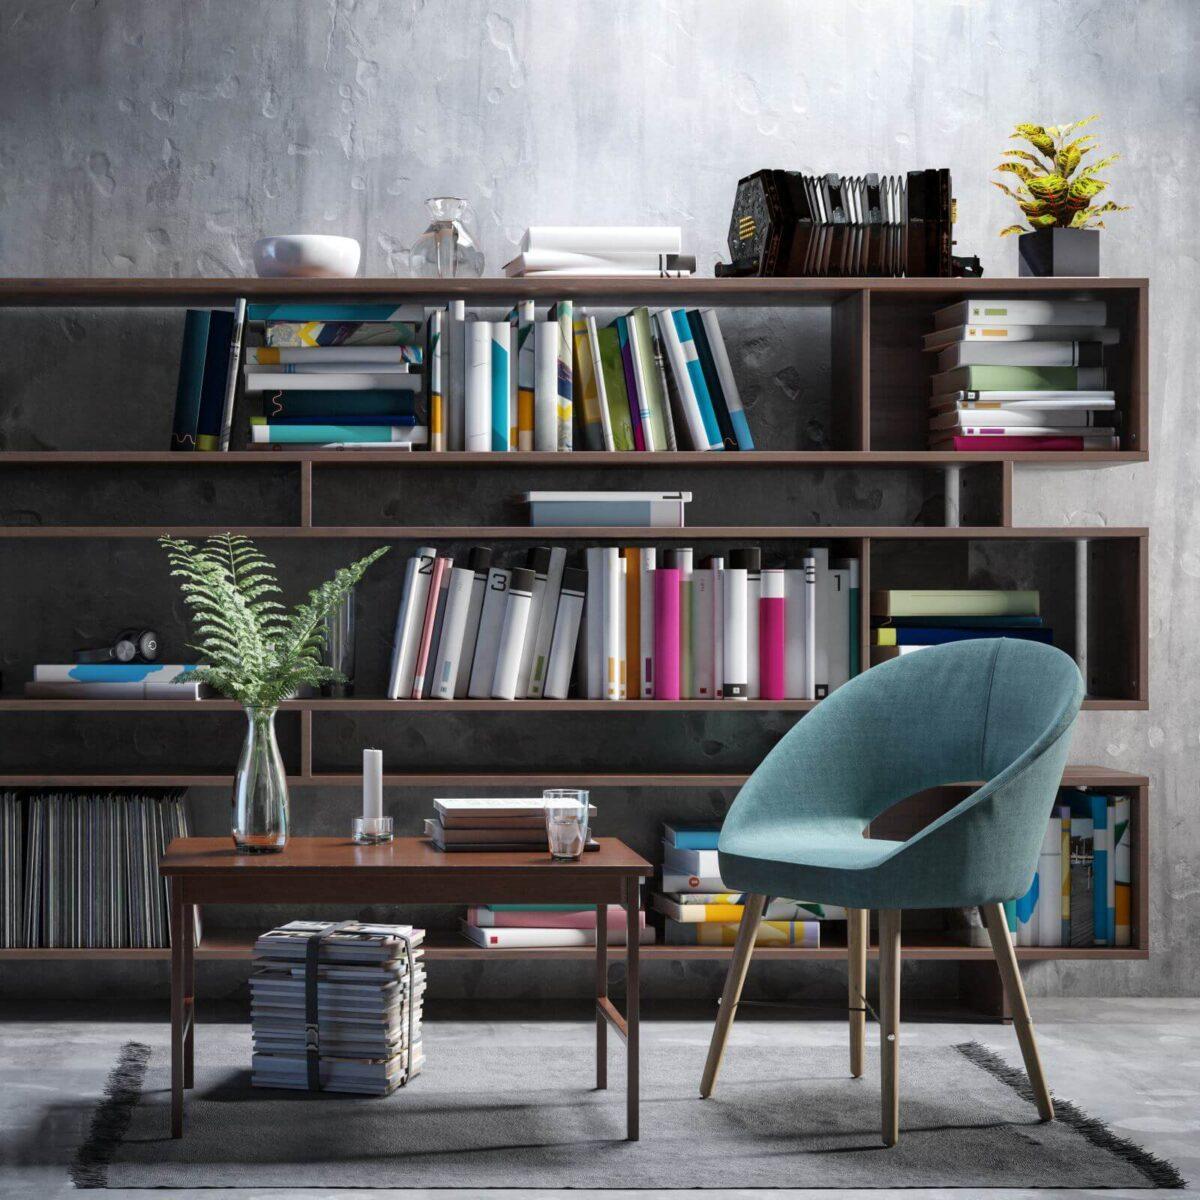 Furnishing Presentation with a Bookshelf - 3d visualization